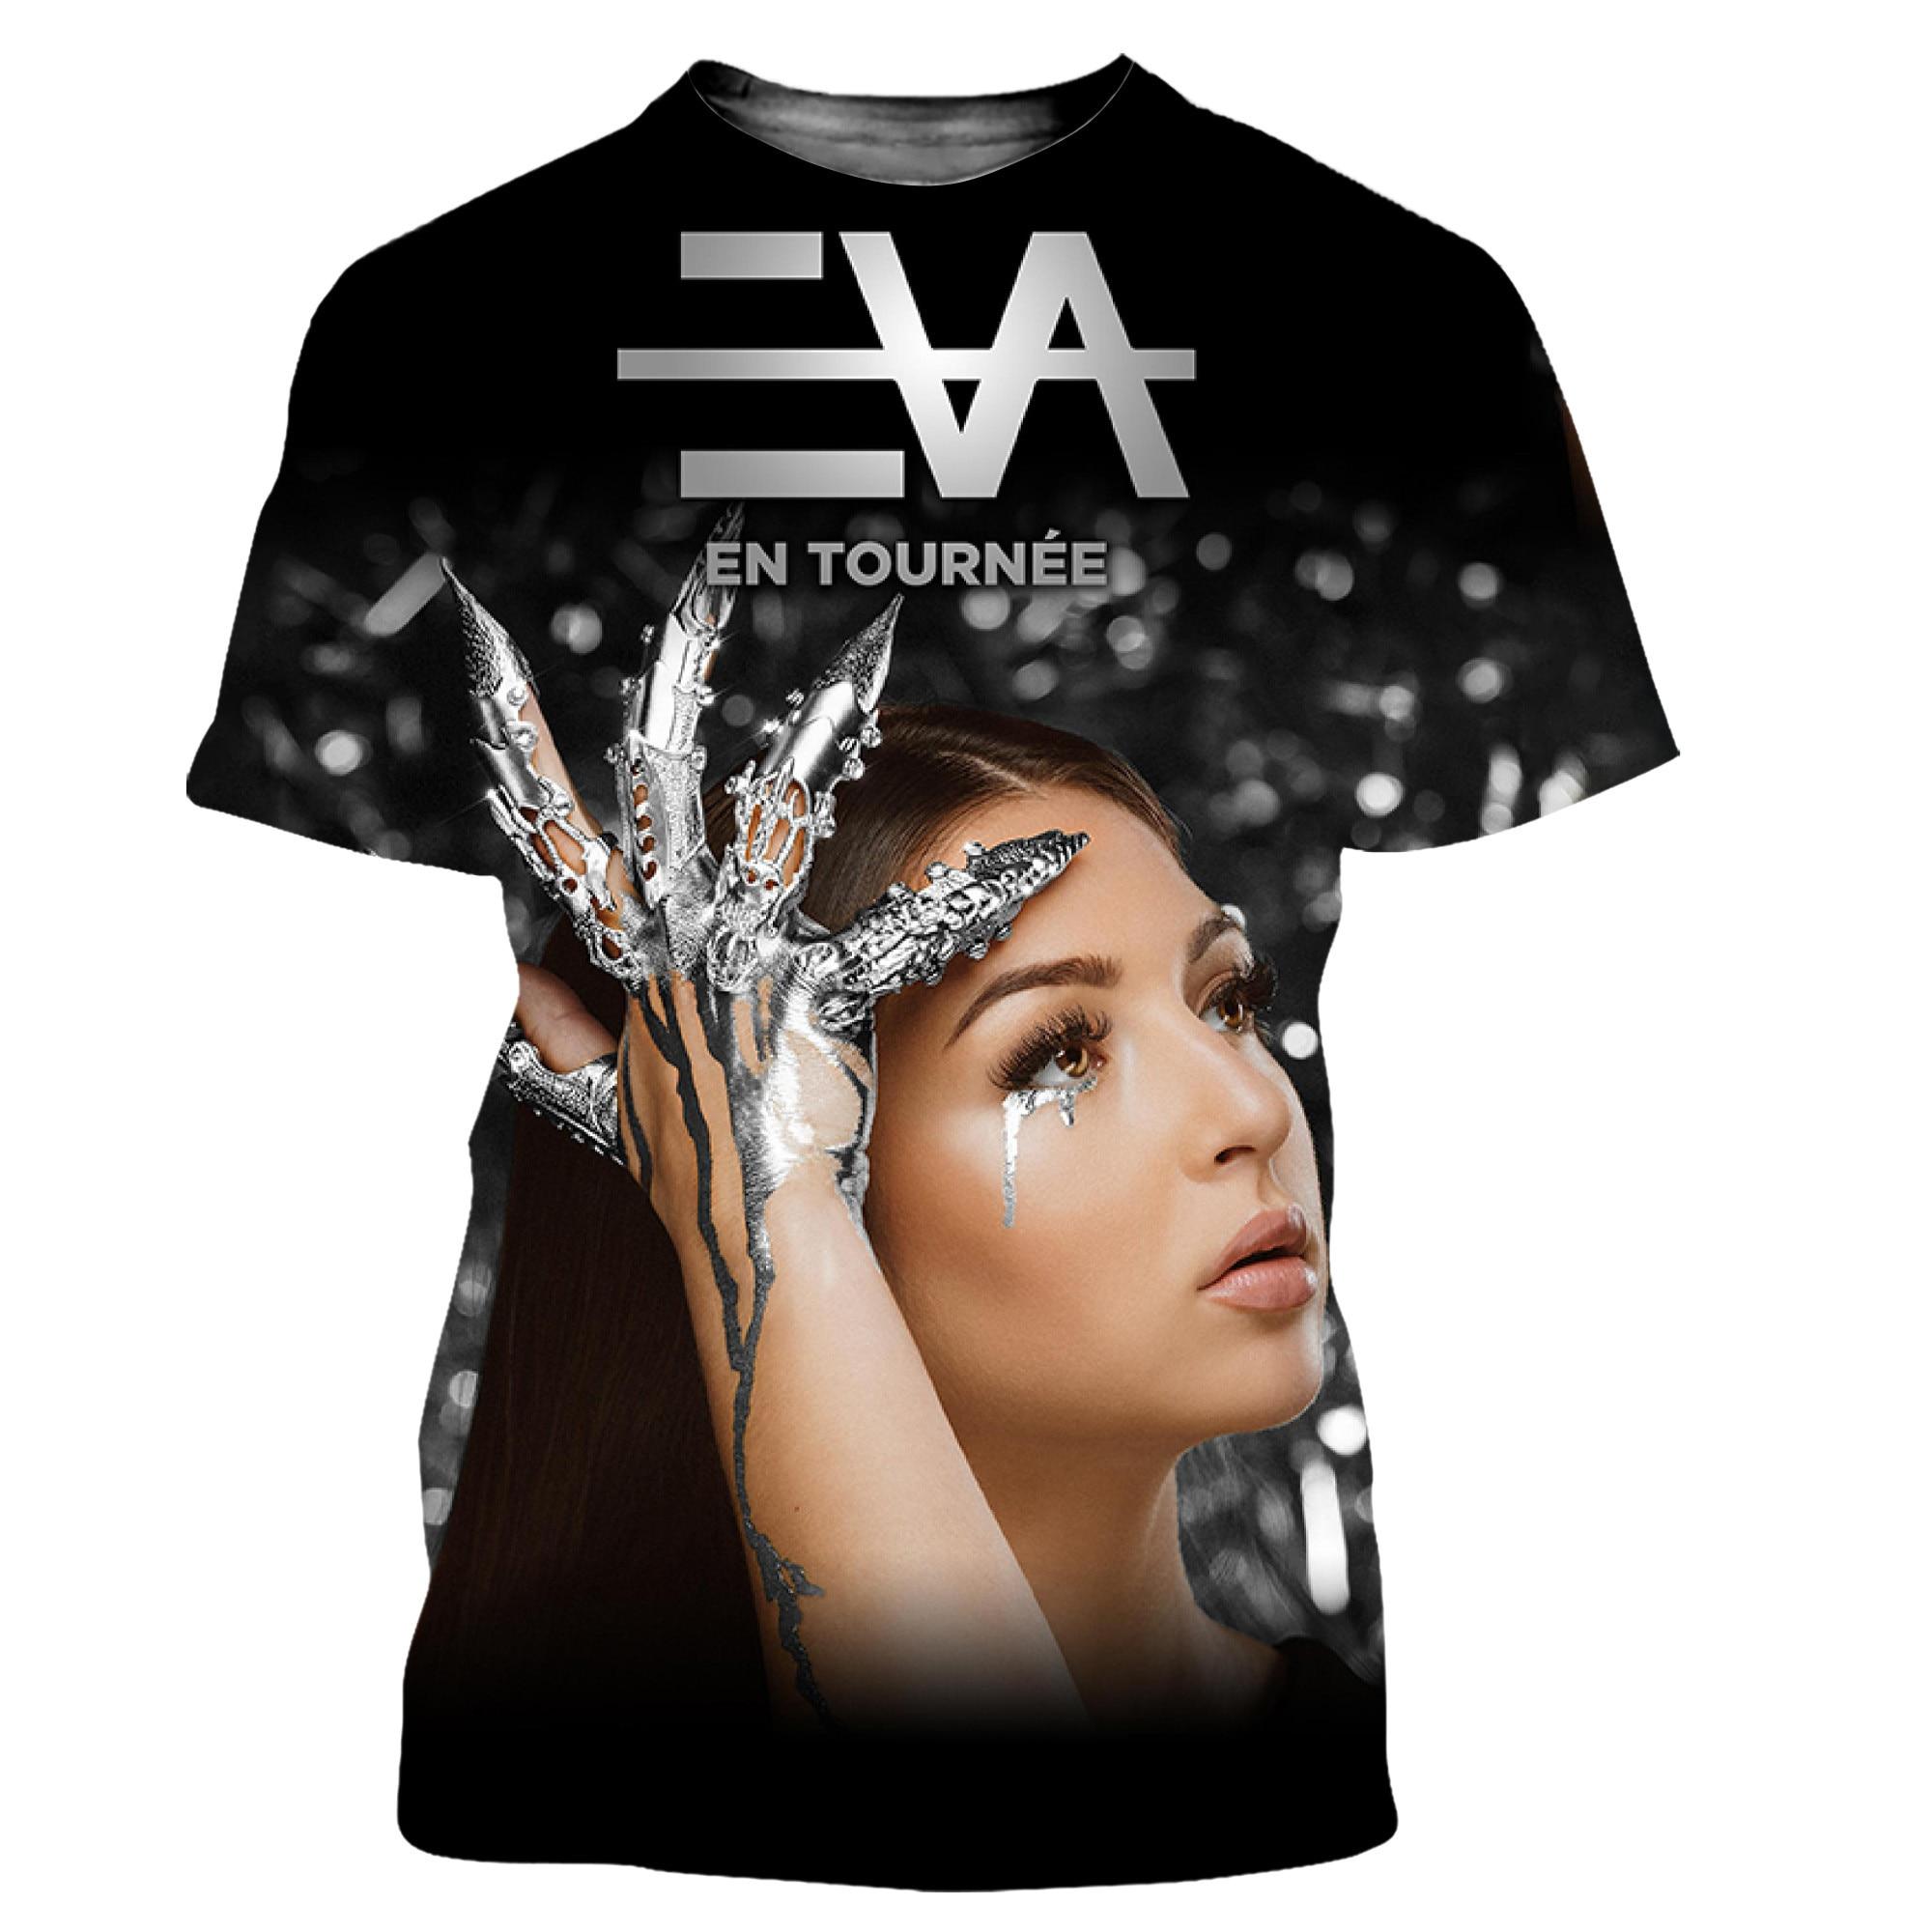 Eva Queen Men/women New Fashion Cool 3D Printed T-shirts Casual Harajuku Style Tshirt Streetwear Tops